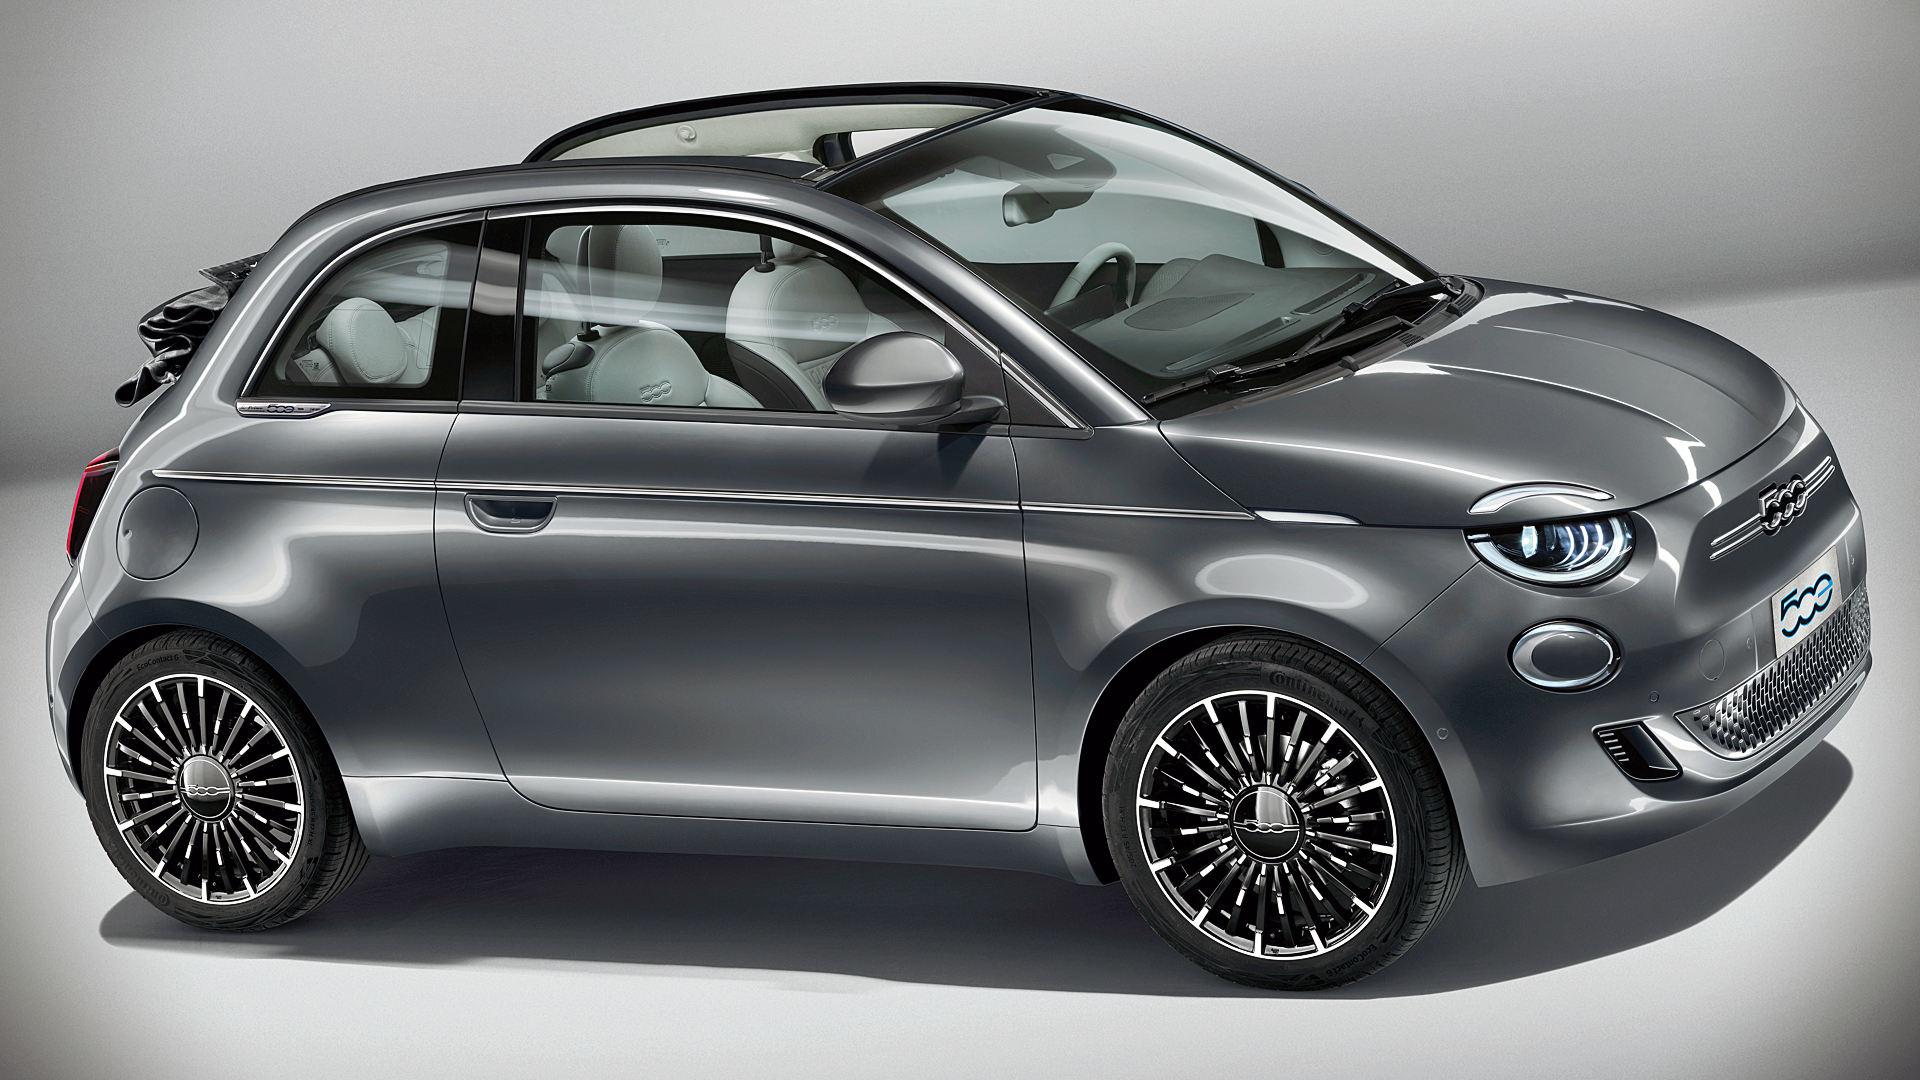 Fiat 500 2021 Wallpaper